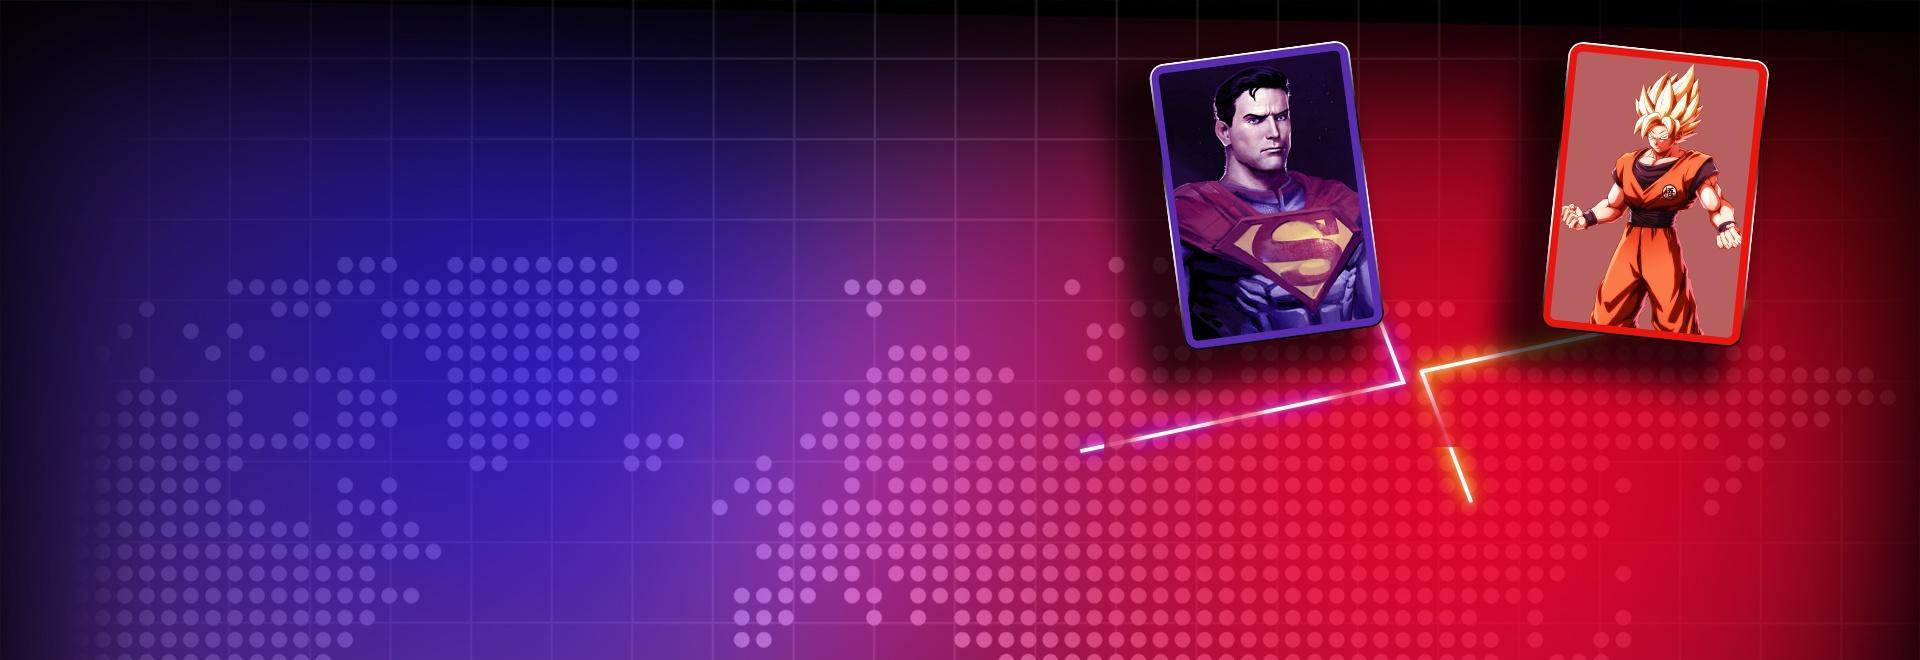 Superman vs Dragonball